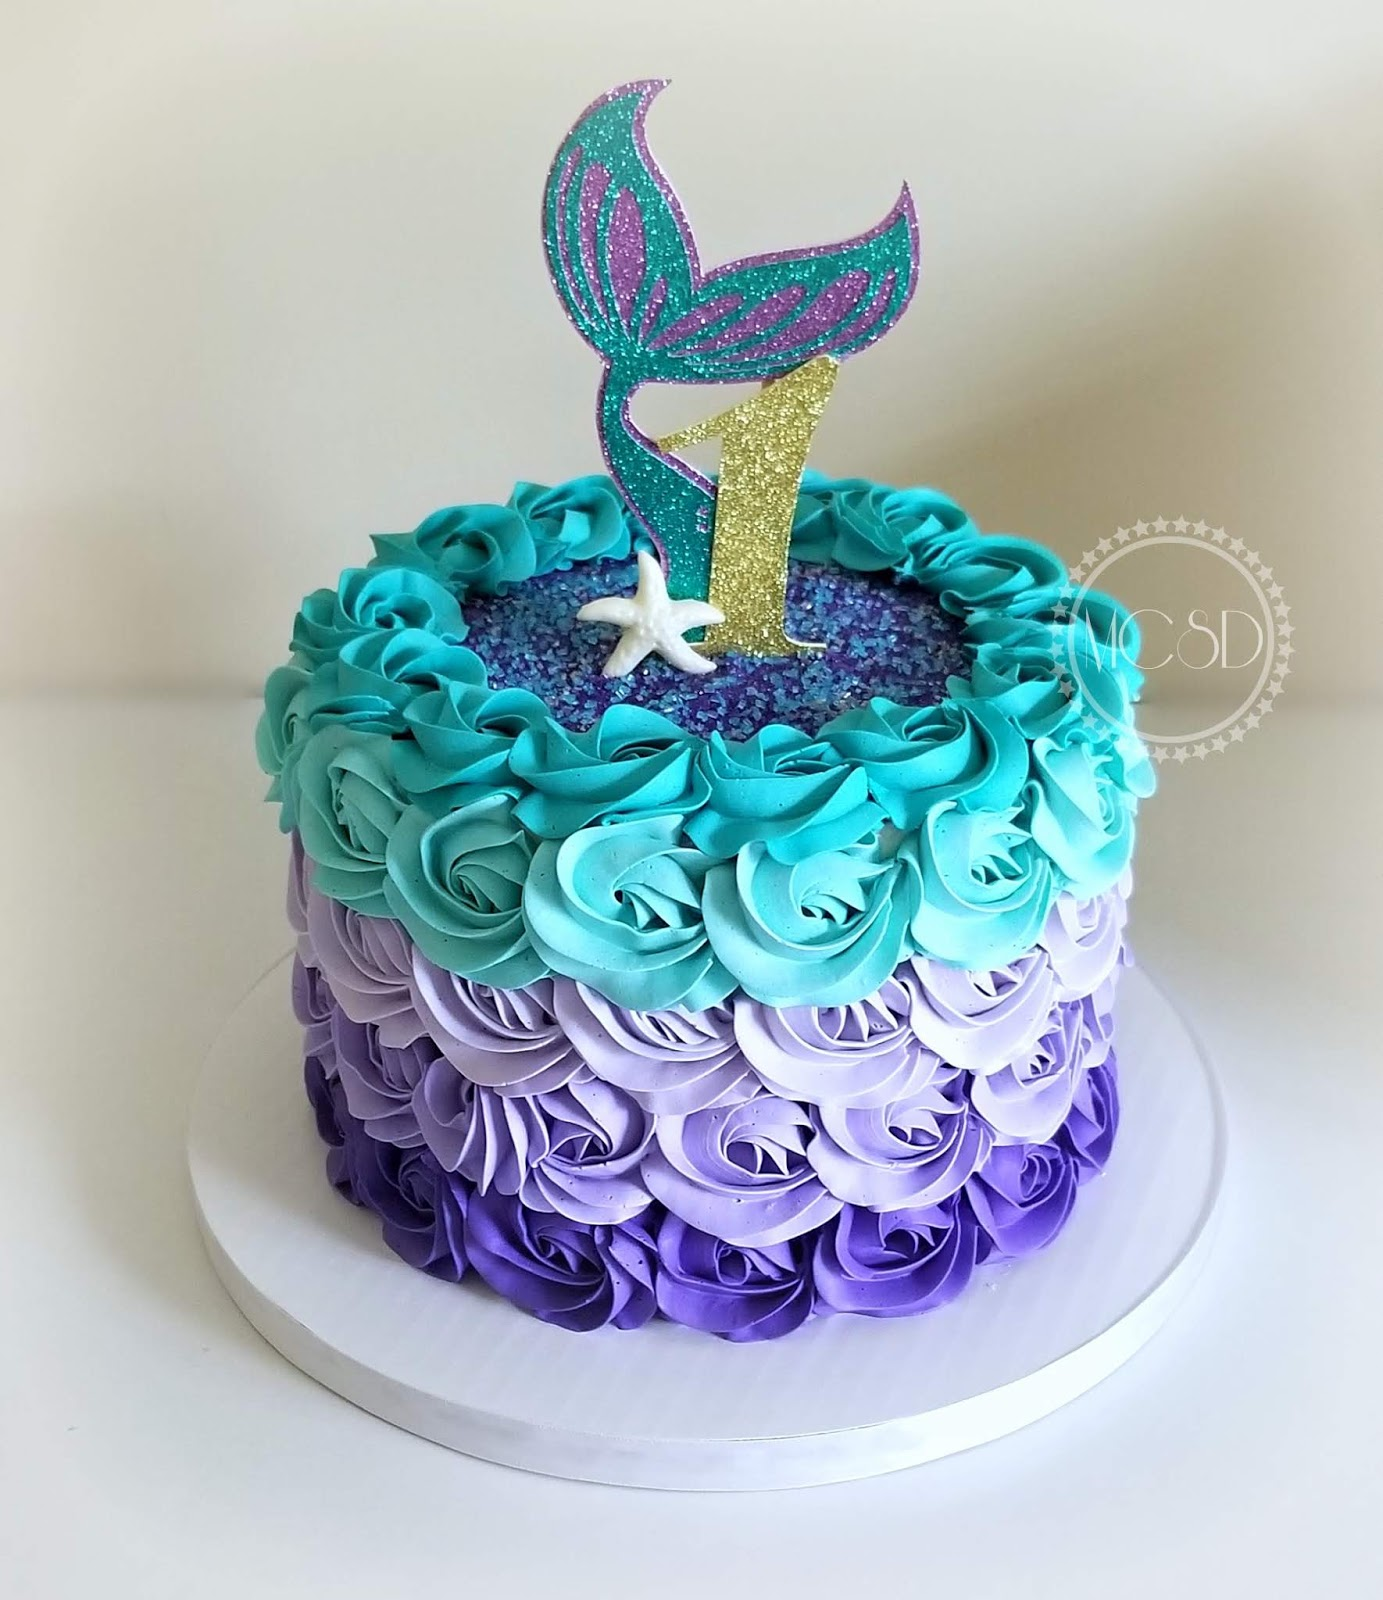 MyCakeSweetDreams: Mermaid Ombre Rosette 1st Birthday Cake